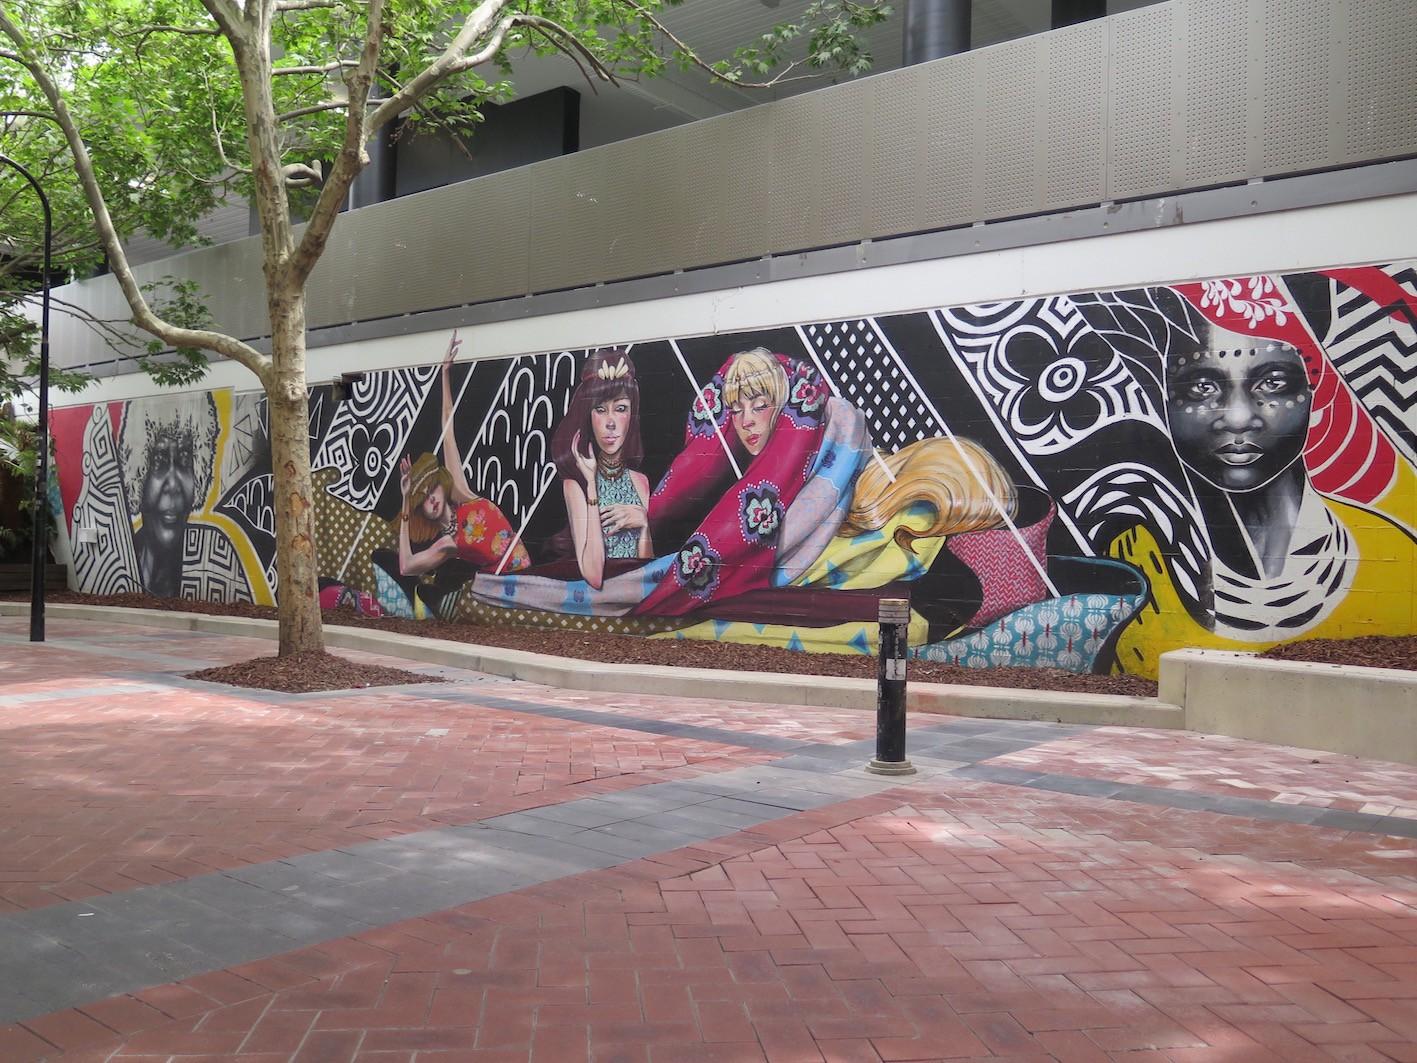 deansunshine_landofsunshine_melbourne_streetart_graffiti_eastland urban art project 6 lucy lucy shannons crees collab 1